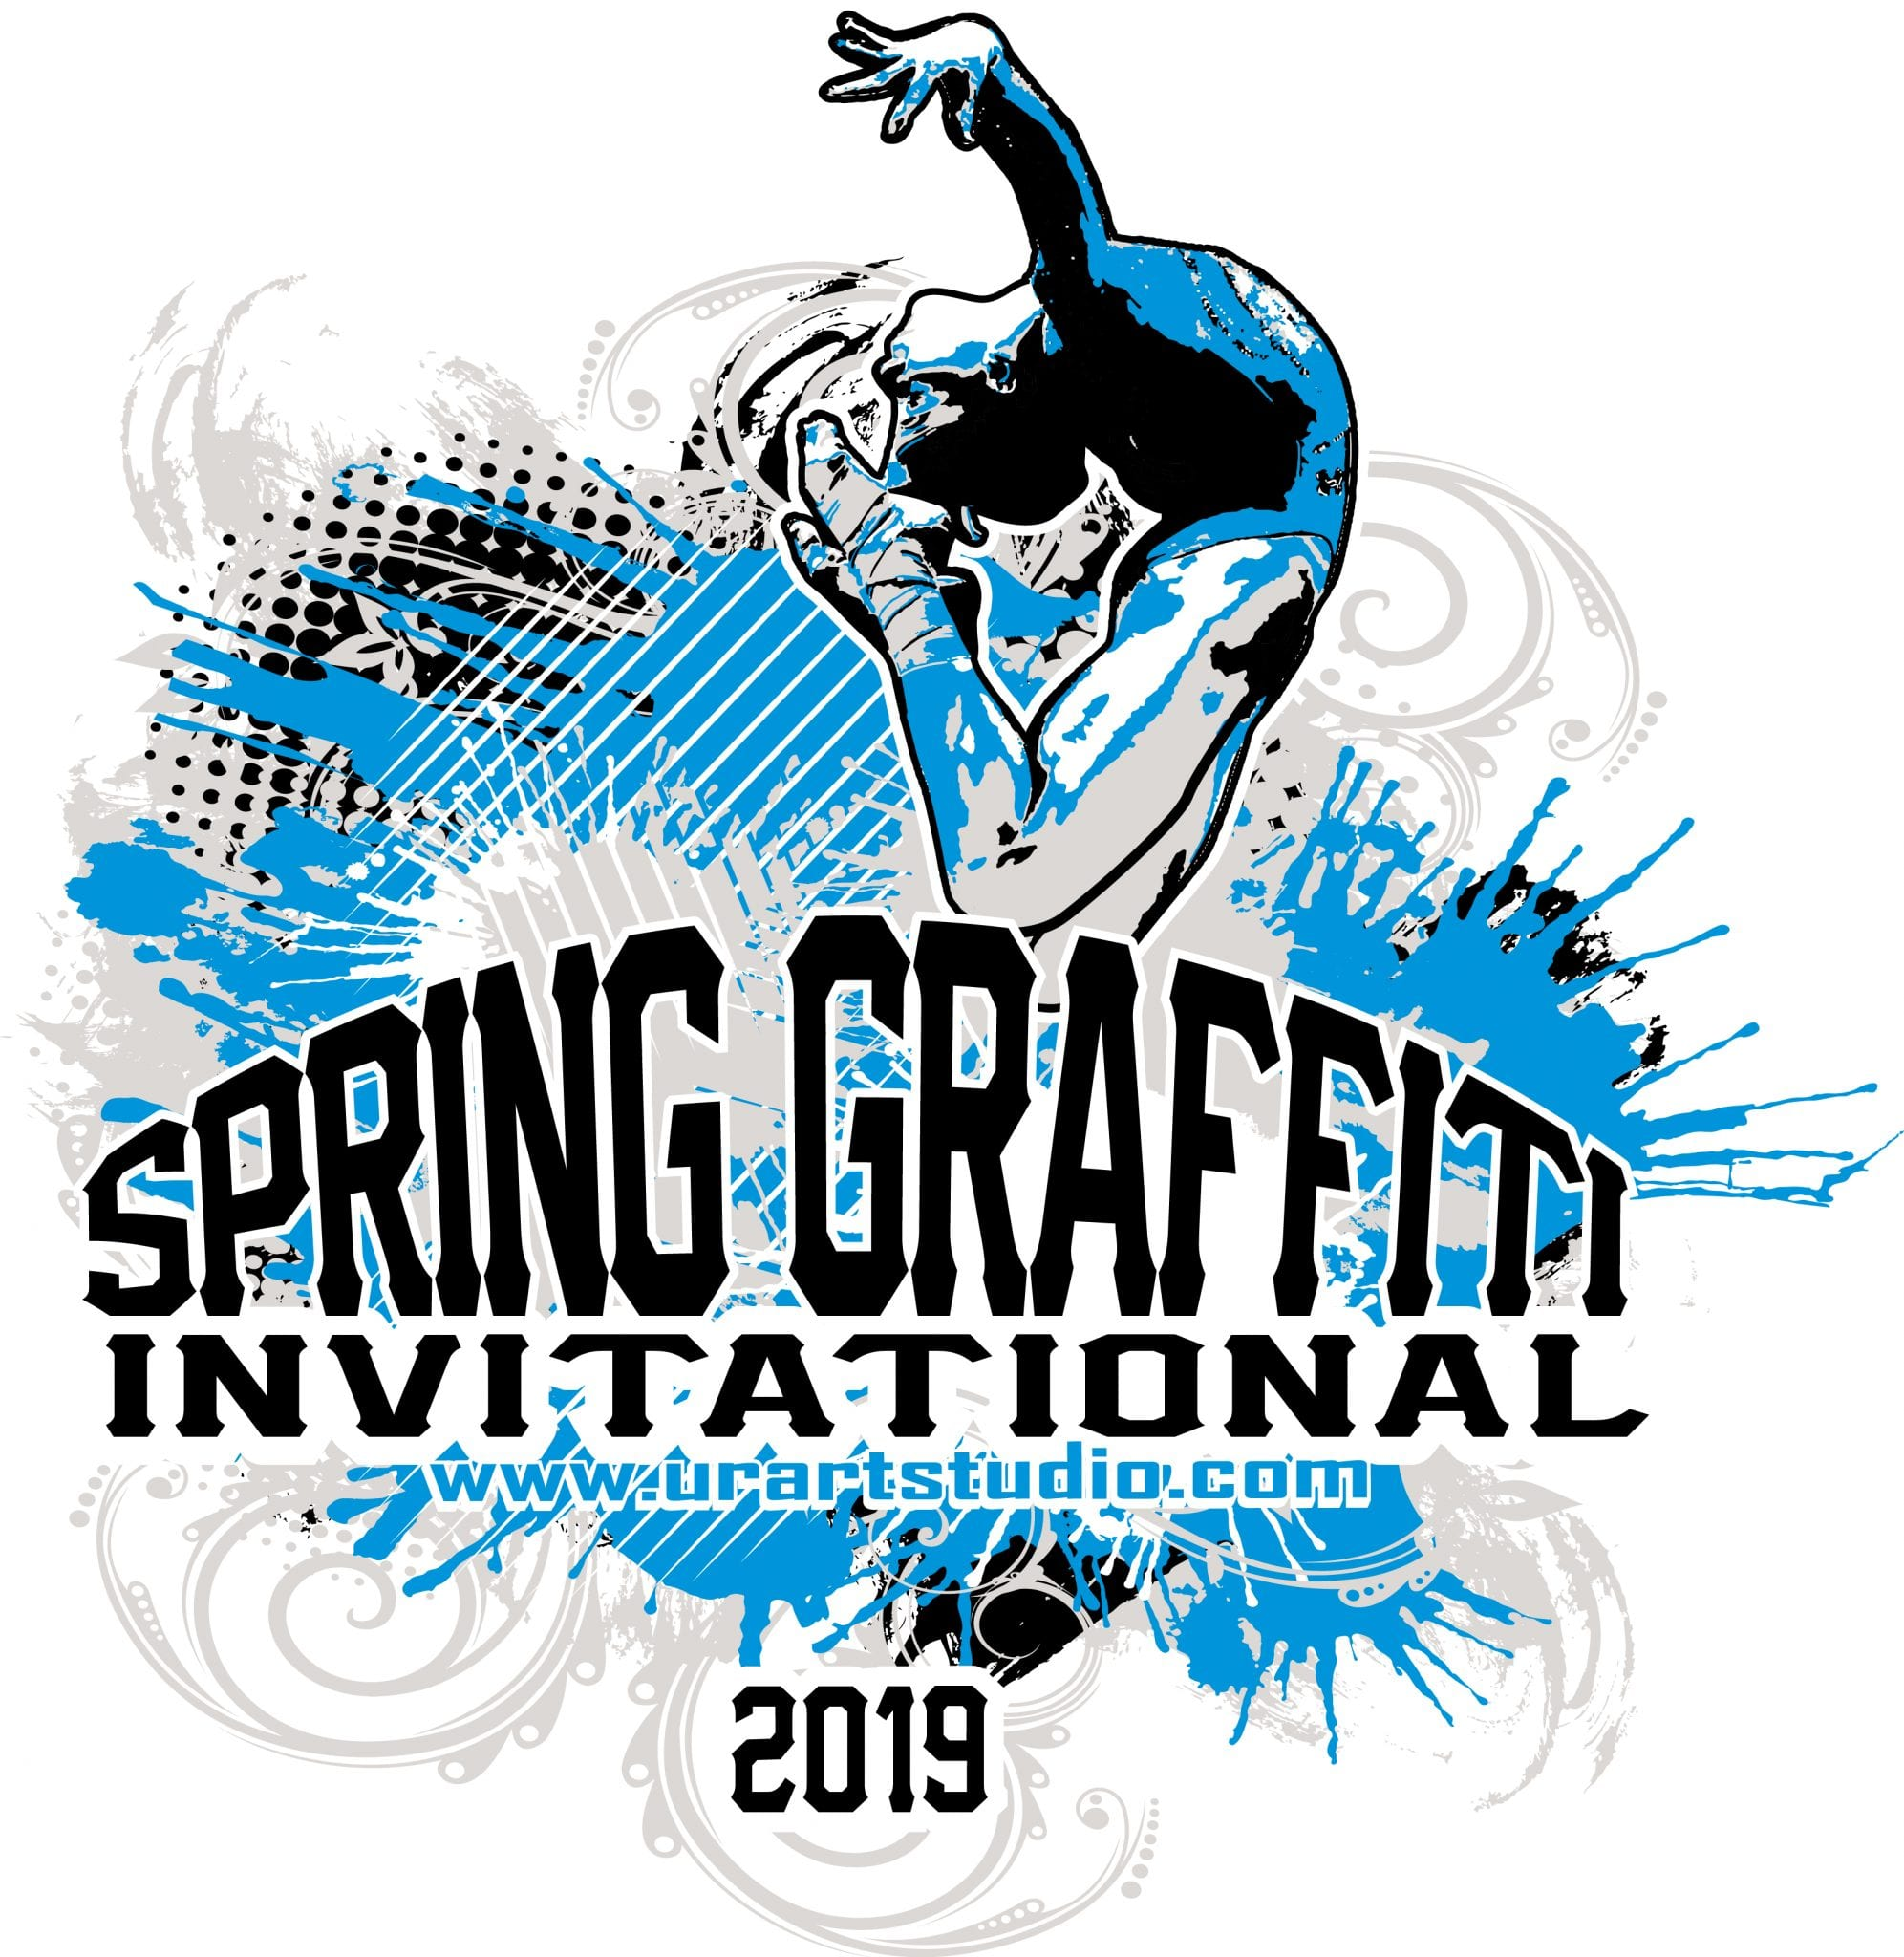 SPRING GRAFFITI INVITATIONAL customizable T-shirt vector logo design for print 2019